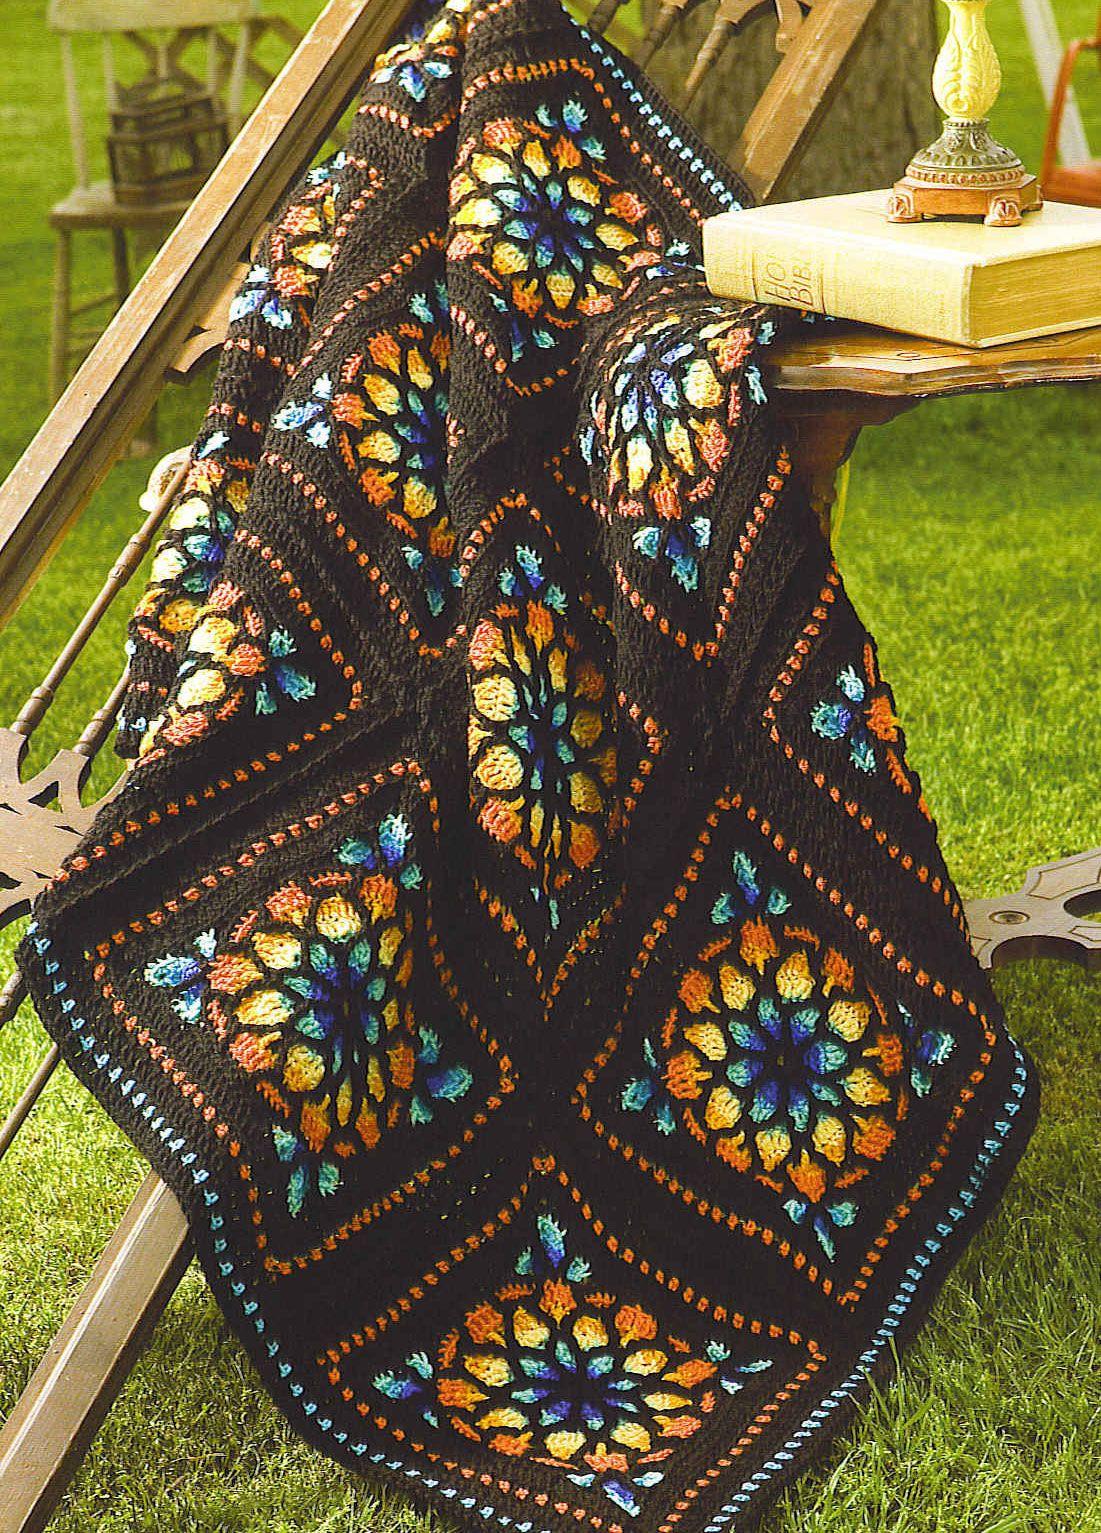 Stained Glass Window Crochet Squares Blanket. Free crochet pattern ...